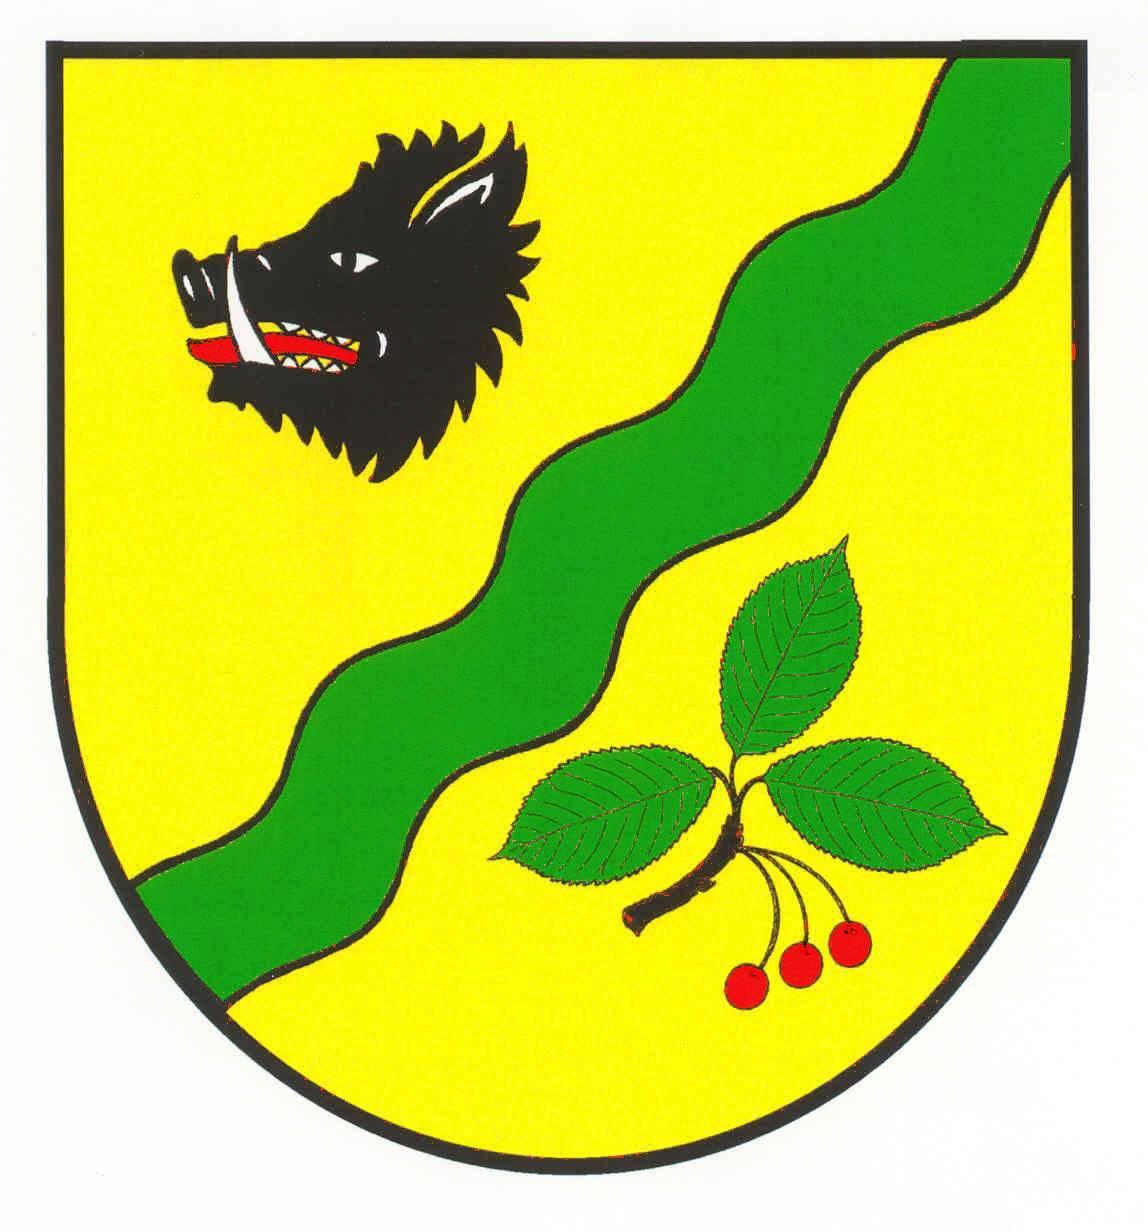 Wappen GemeindeKabelhorst, Kreis Ostholstein